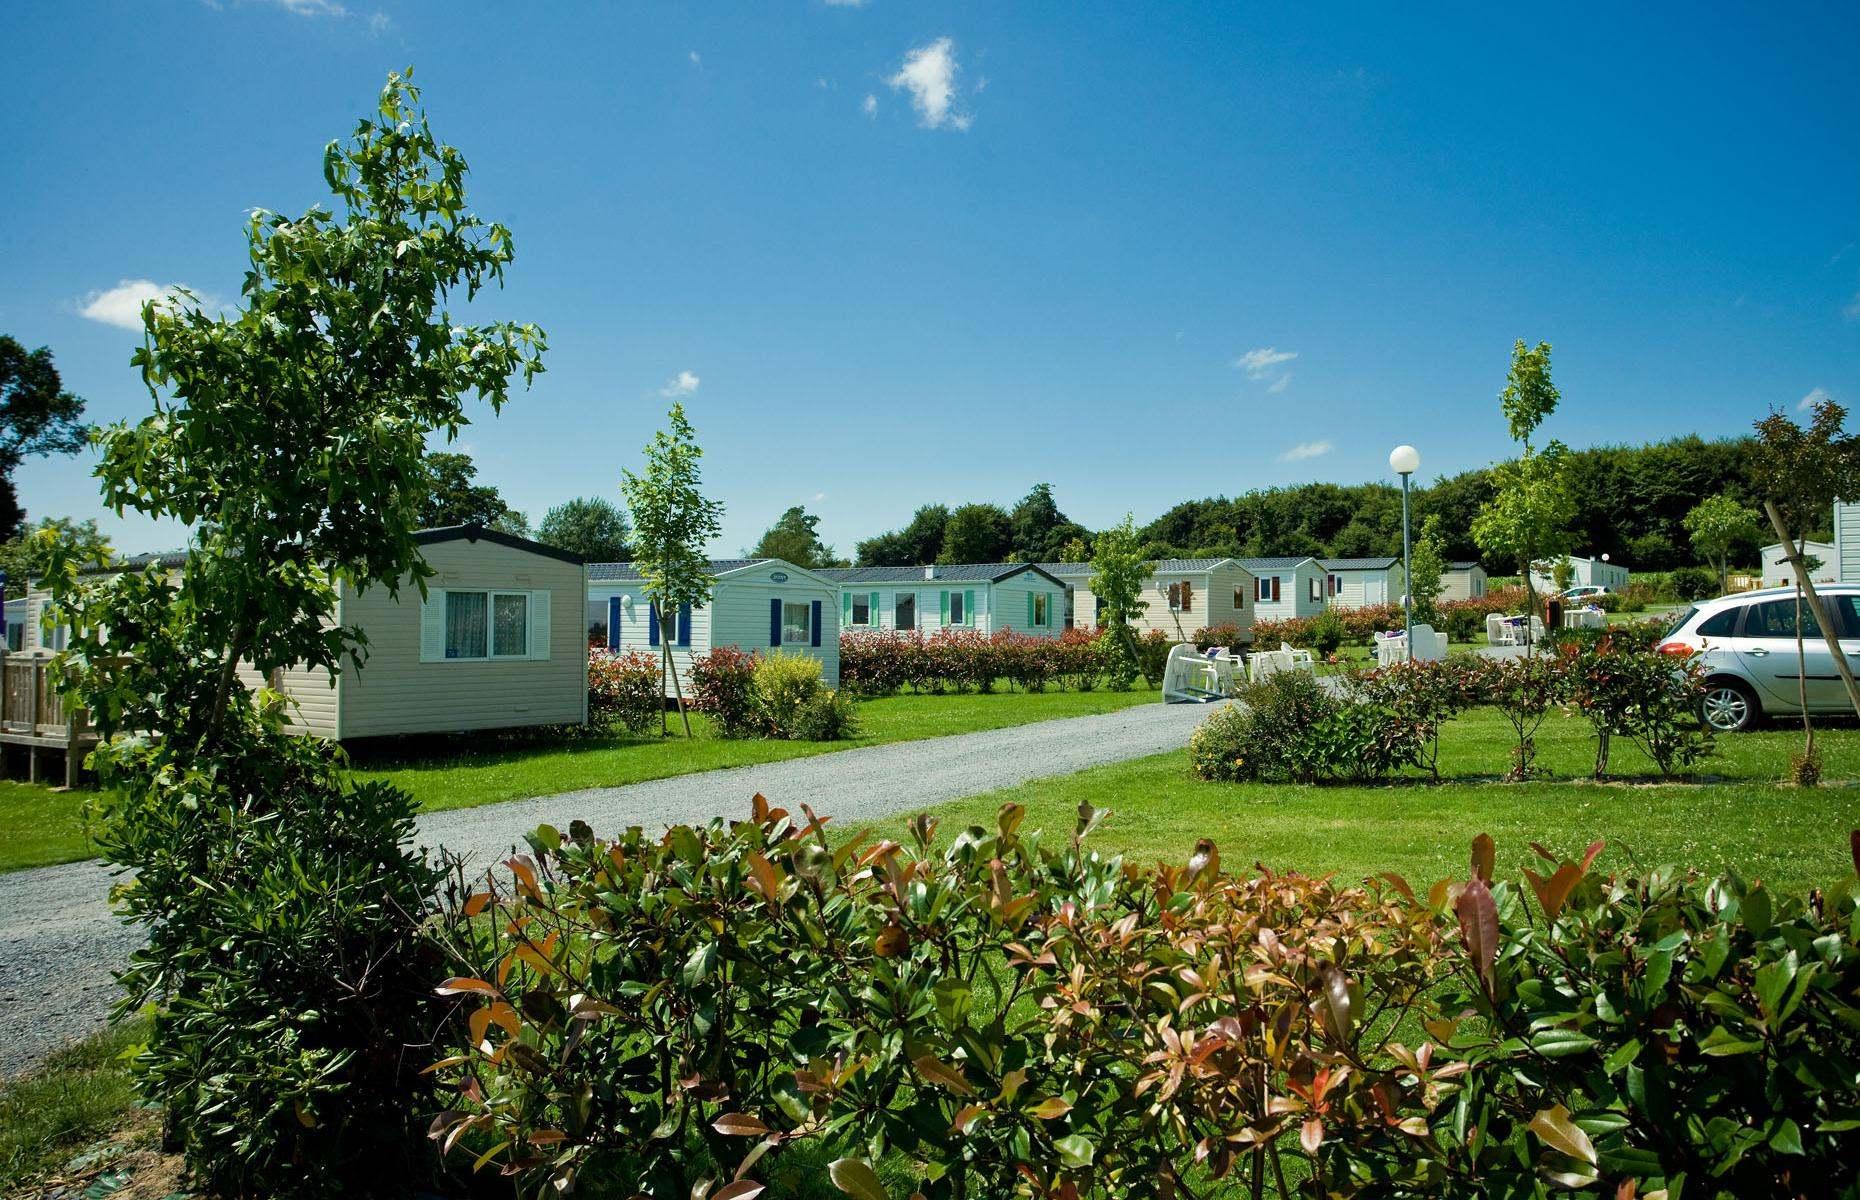 Campsite in Normandy (Image: Siblu)